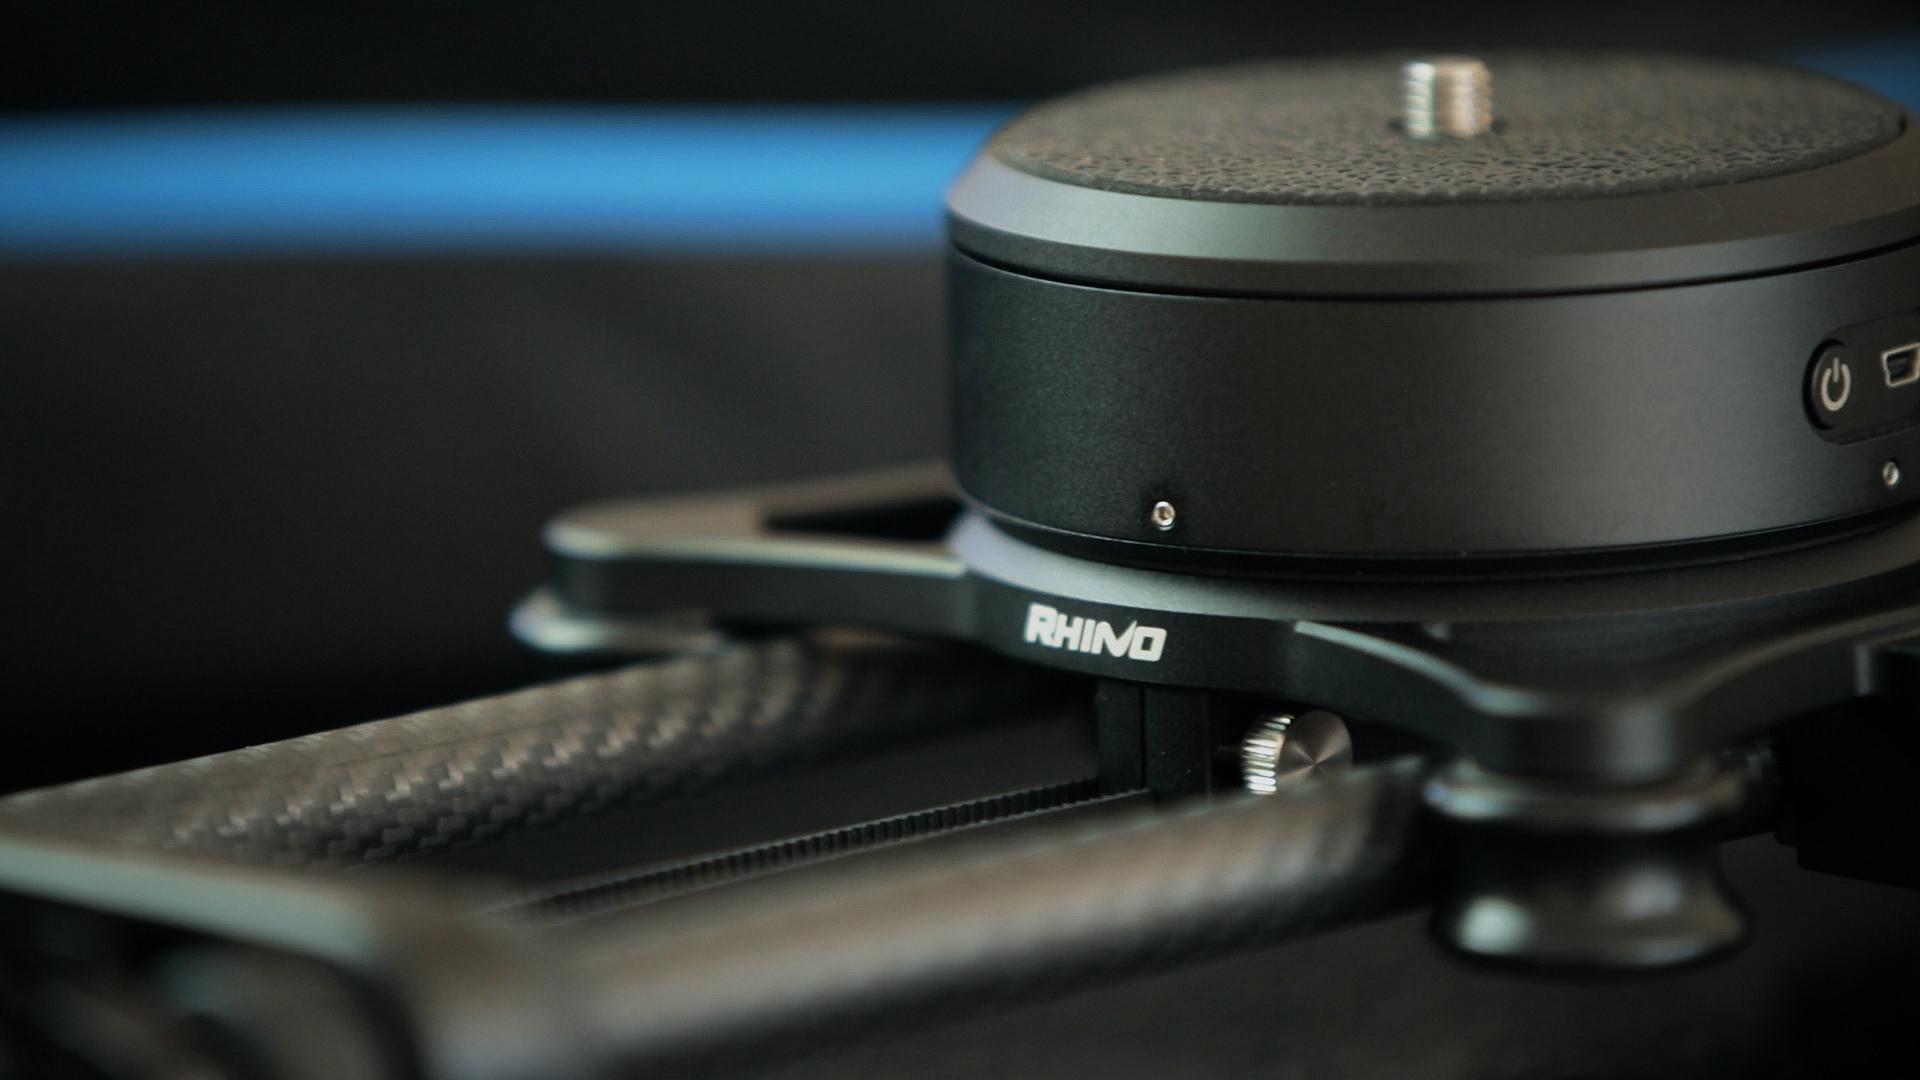 Rhino Camera Gear Slider